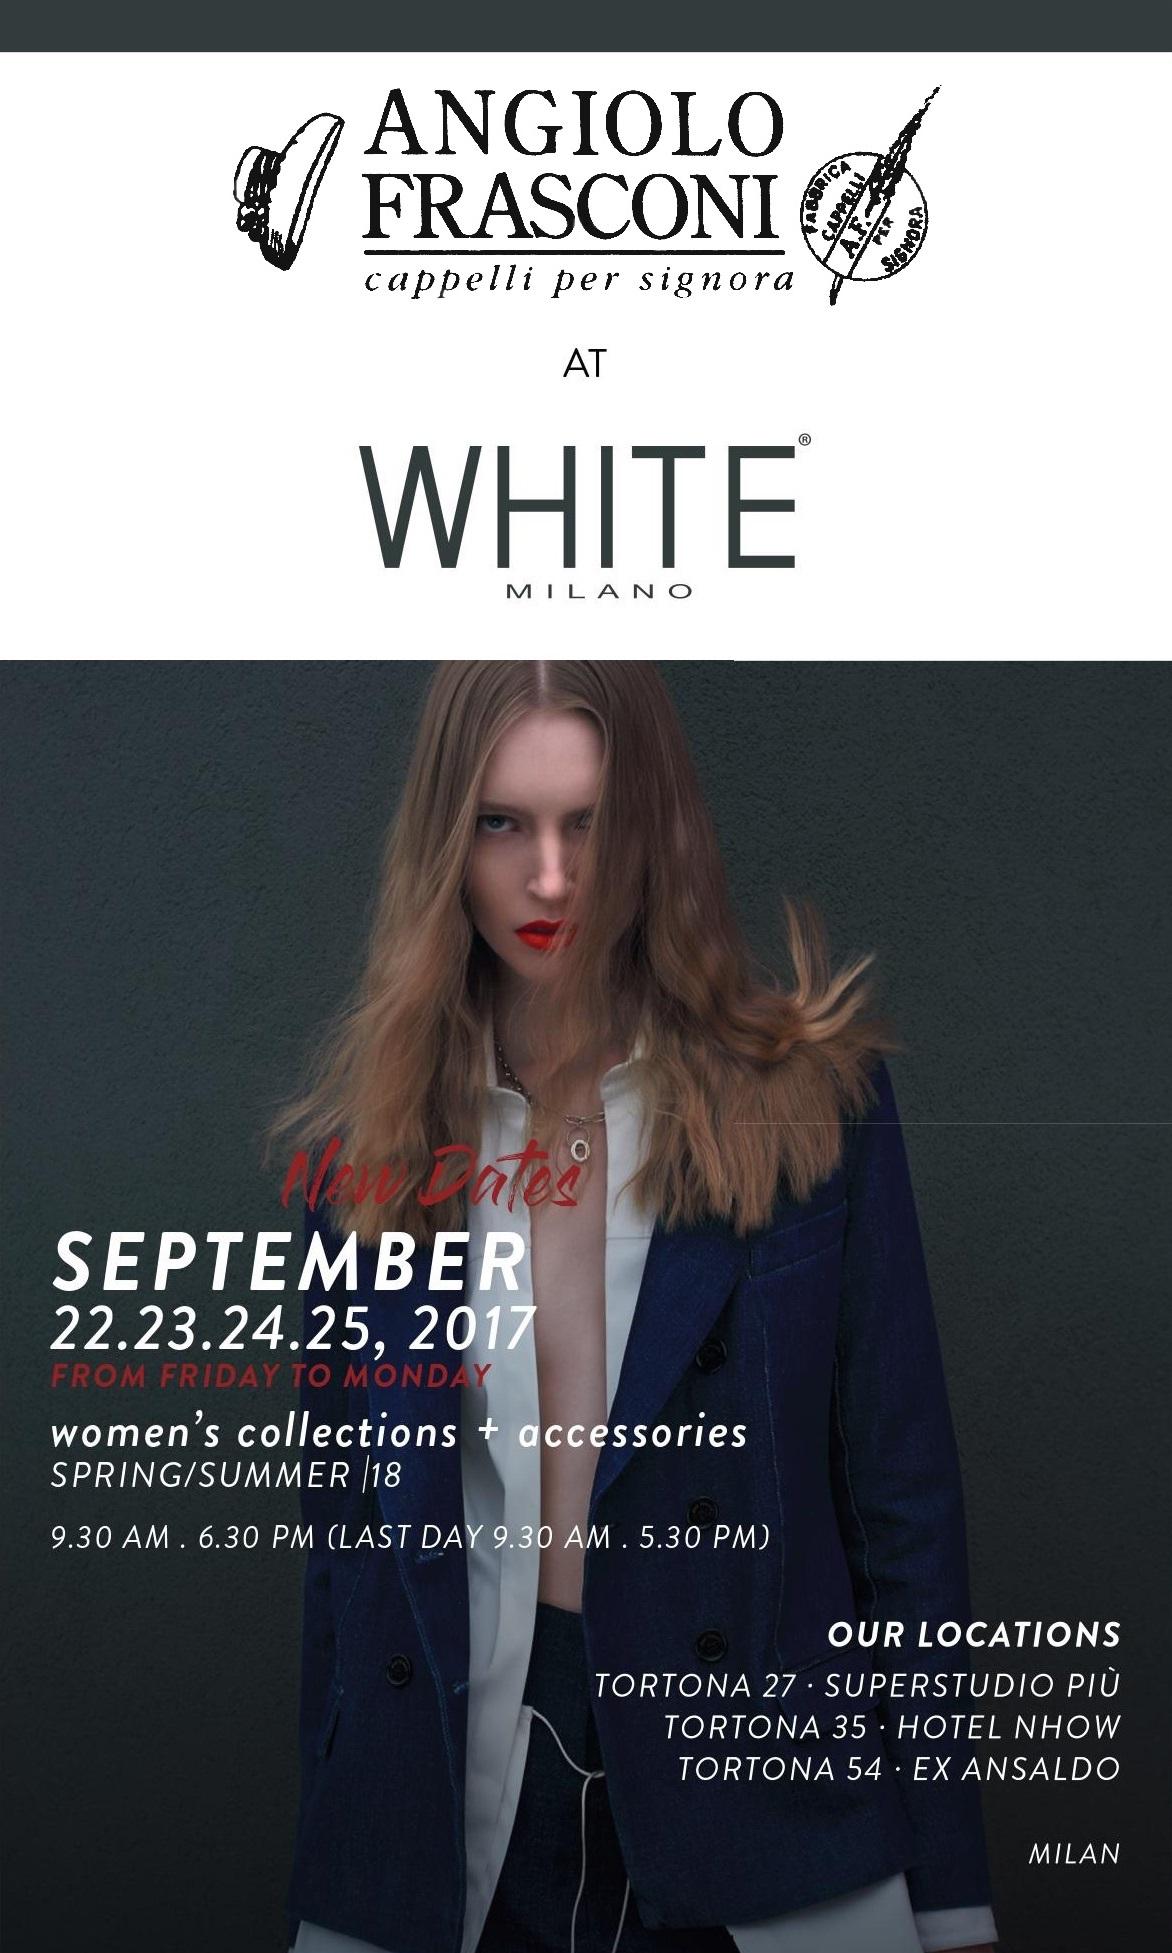 white milan - september 2017 - angiolo frasconi